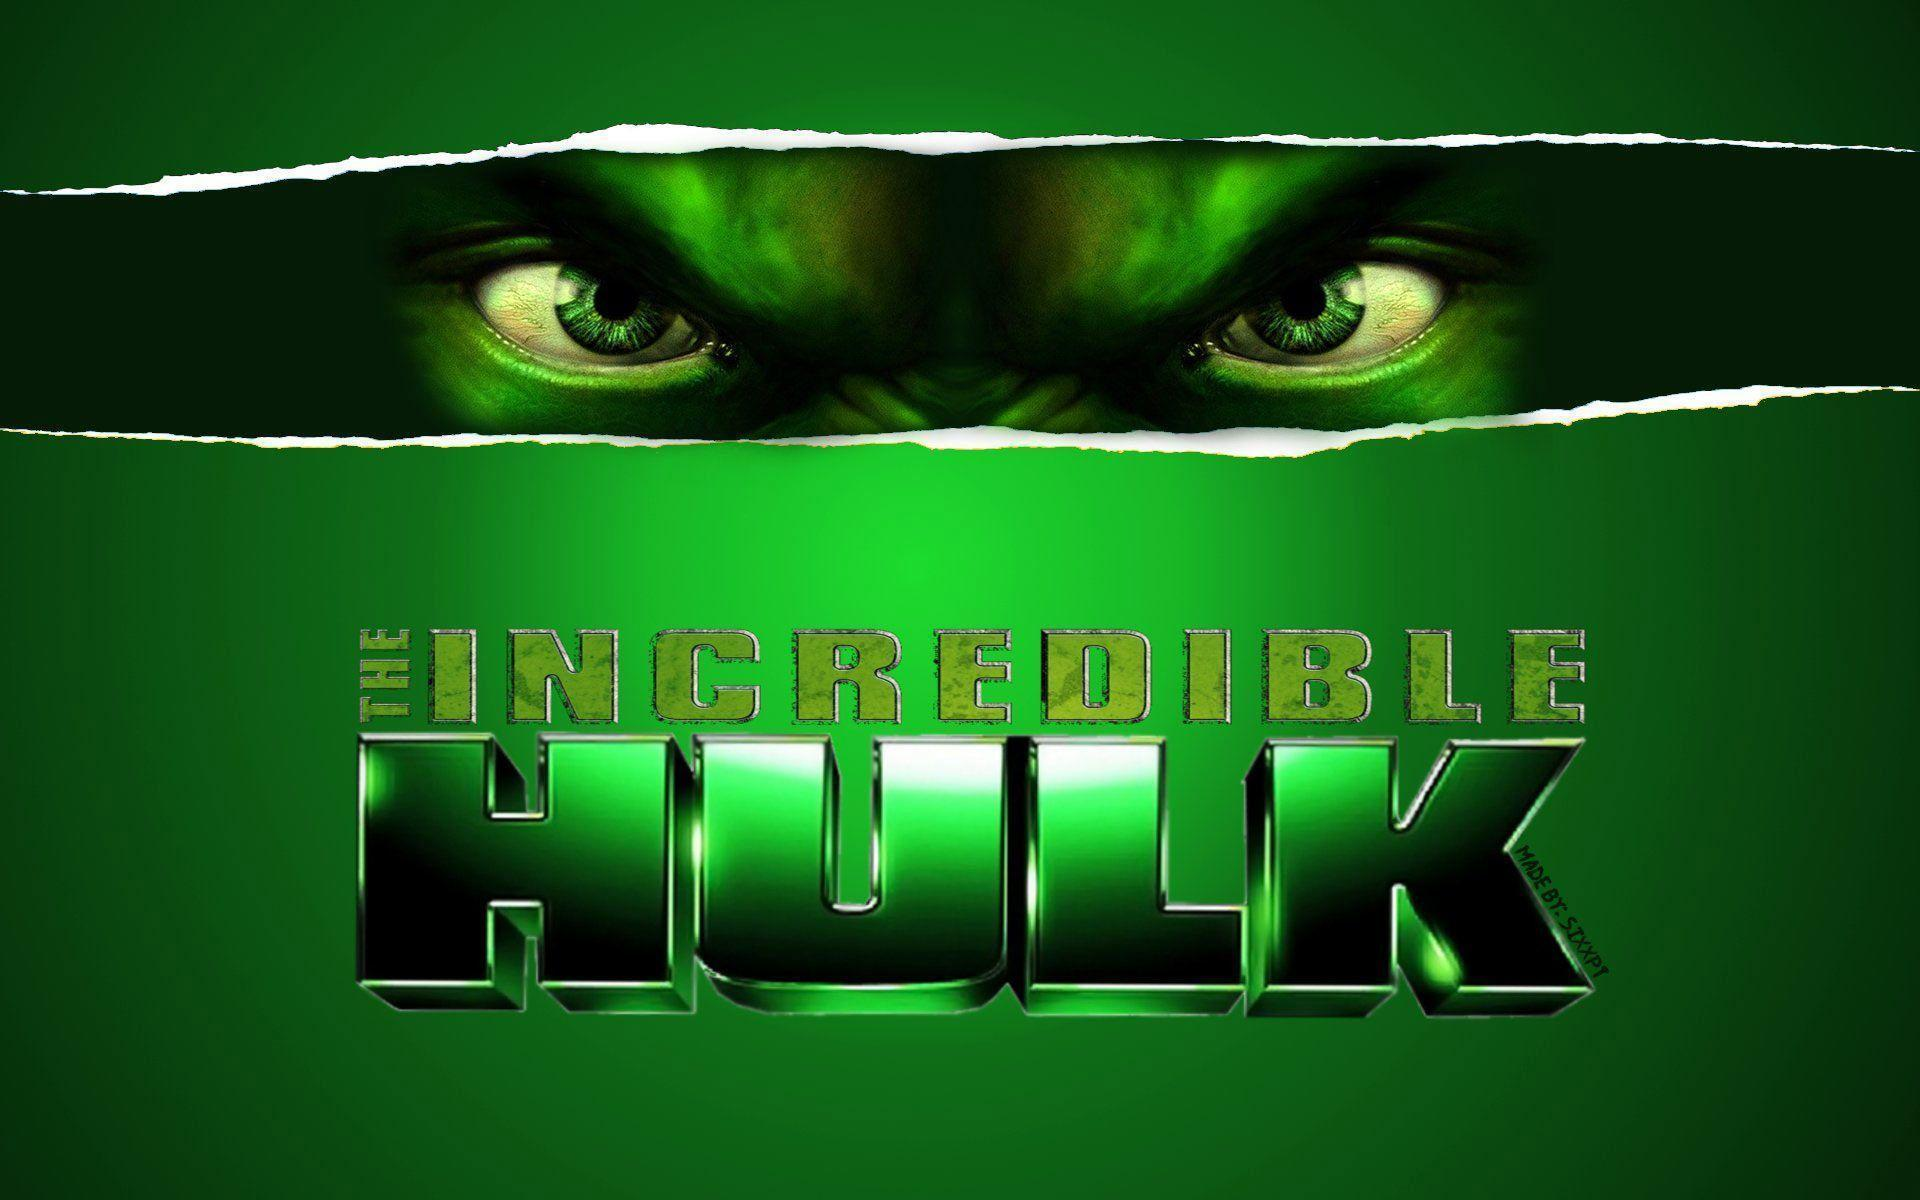 Incredible Hulk Wallpapers - Full HD wallpaper search - page 2